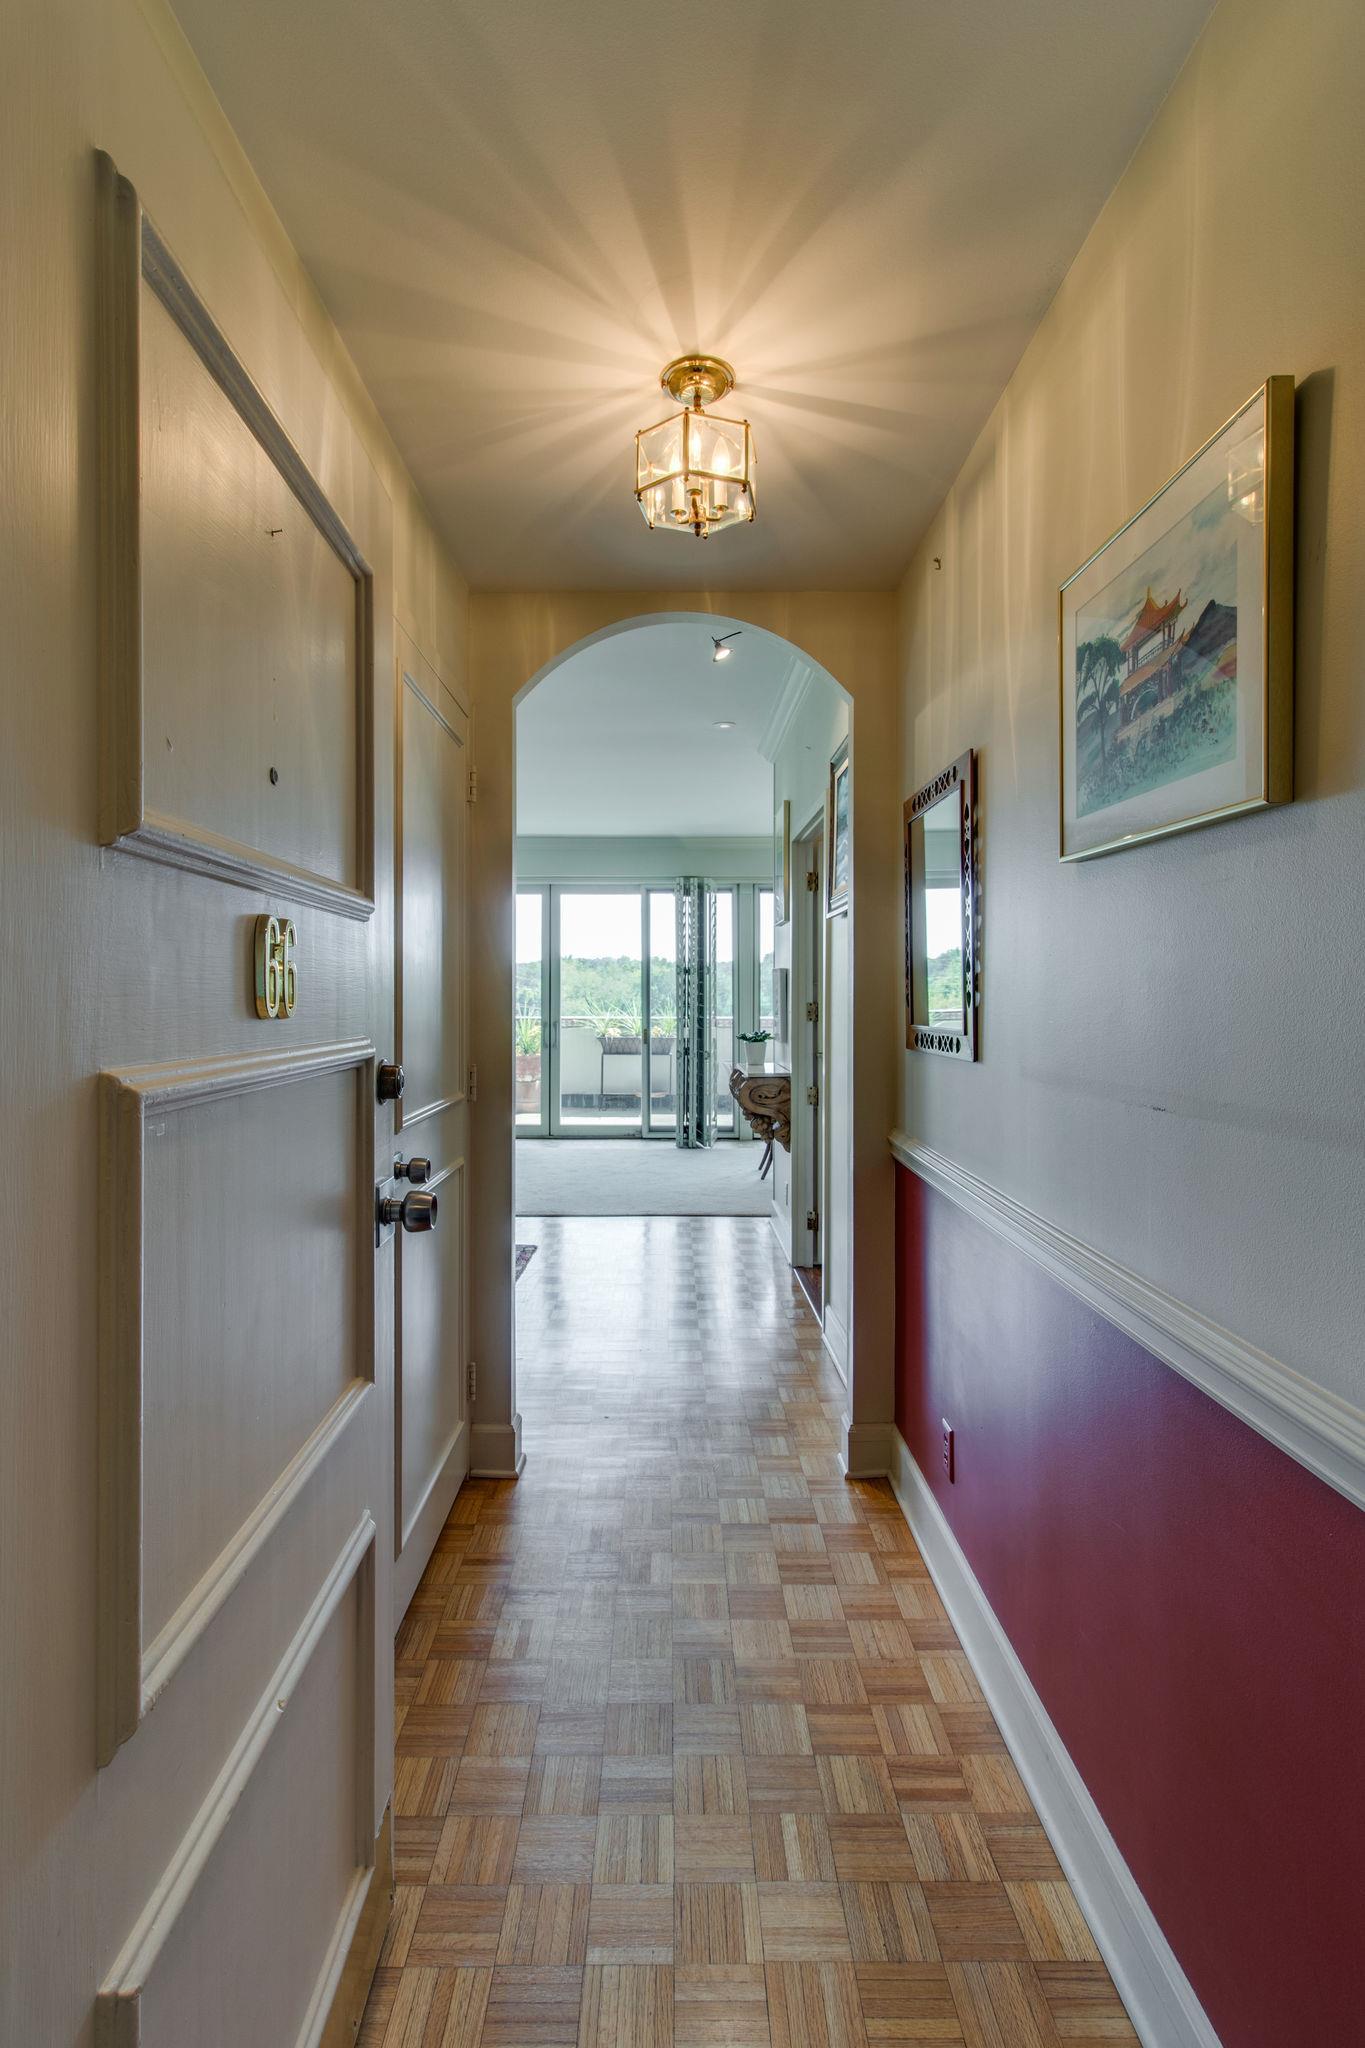 105 Leake Ave Apt 66, Nashville, TN 37205 - Nashville, TN real estate listing